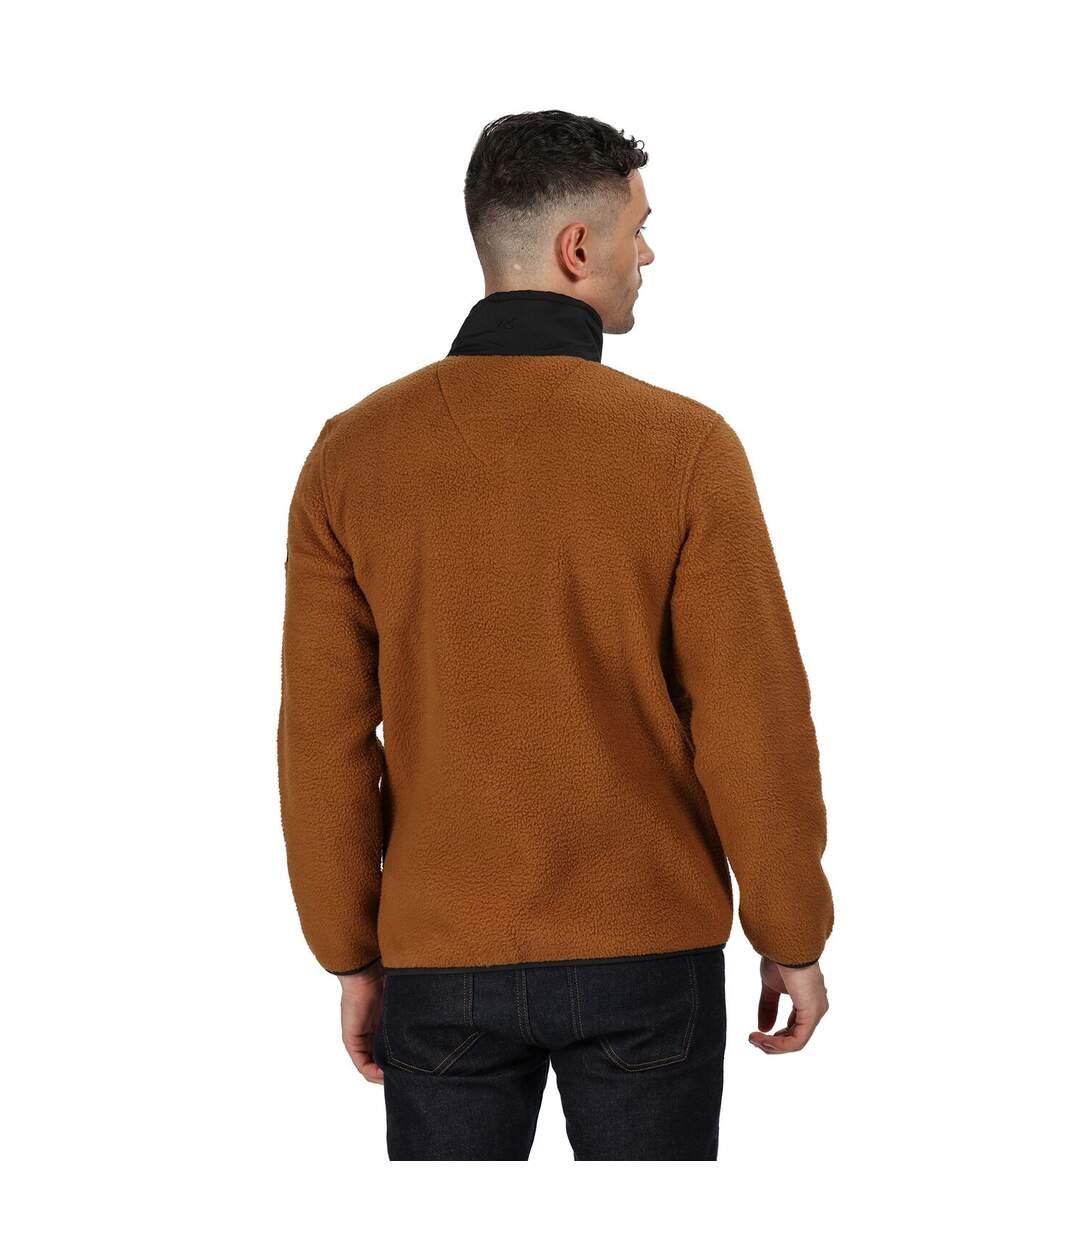 Regatta Mens Cayo Heavyweight Full Zip Fleece Jacket (Brown Tan/Black) - UTRG4599